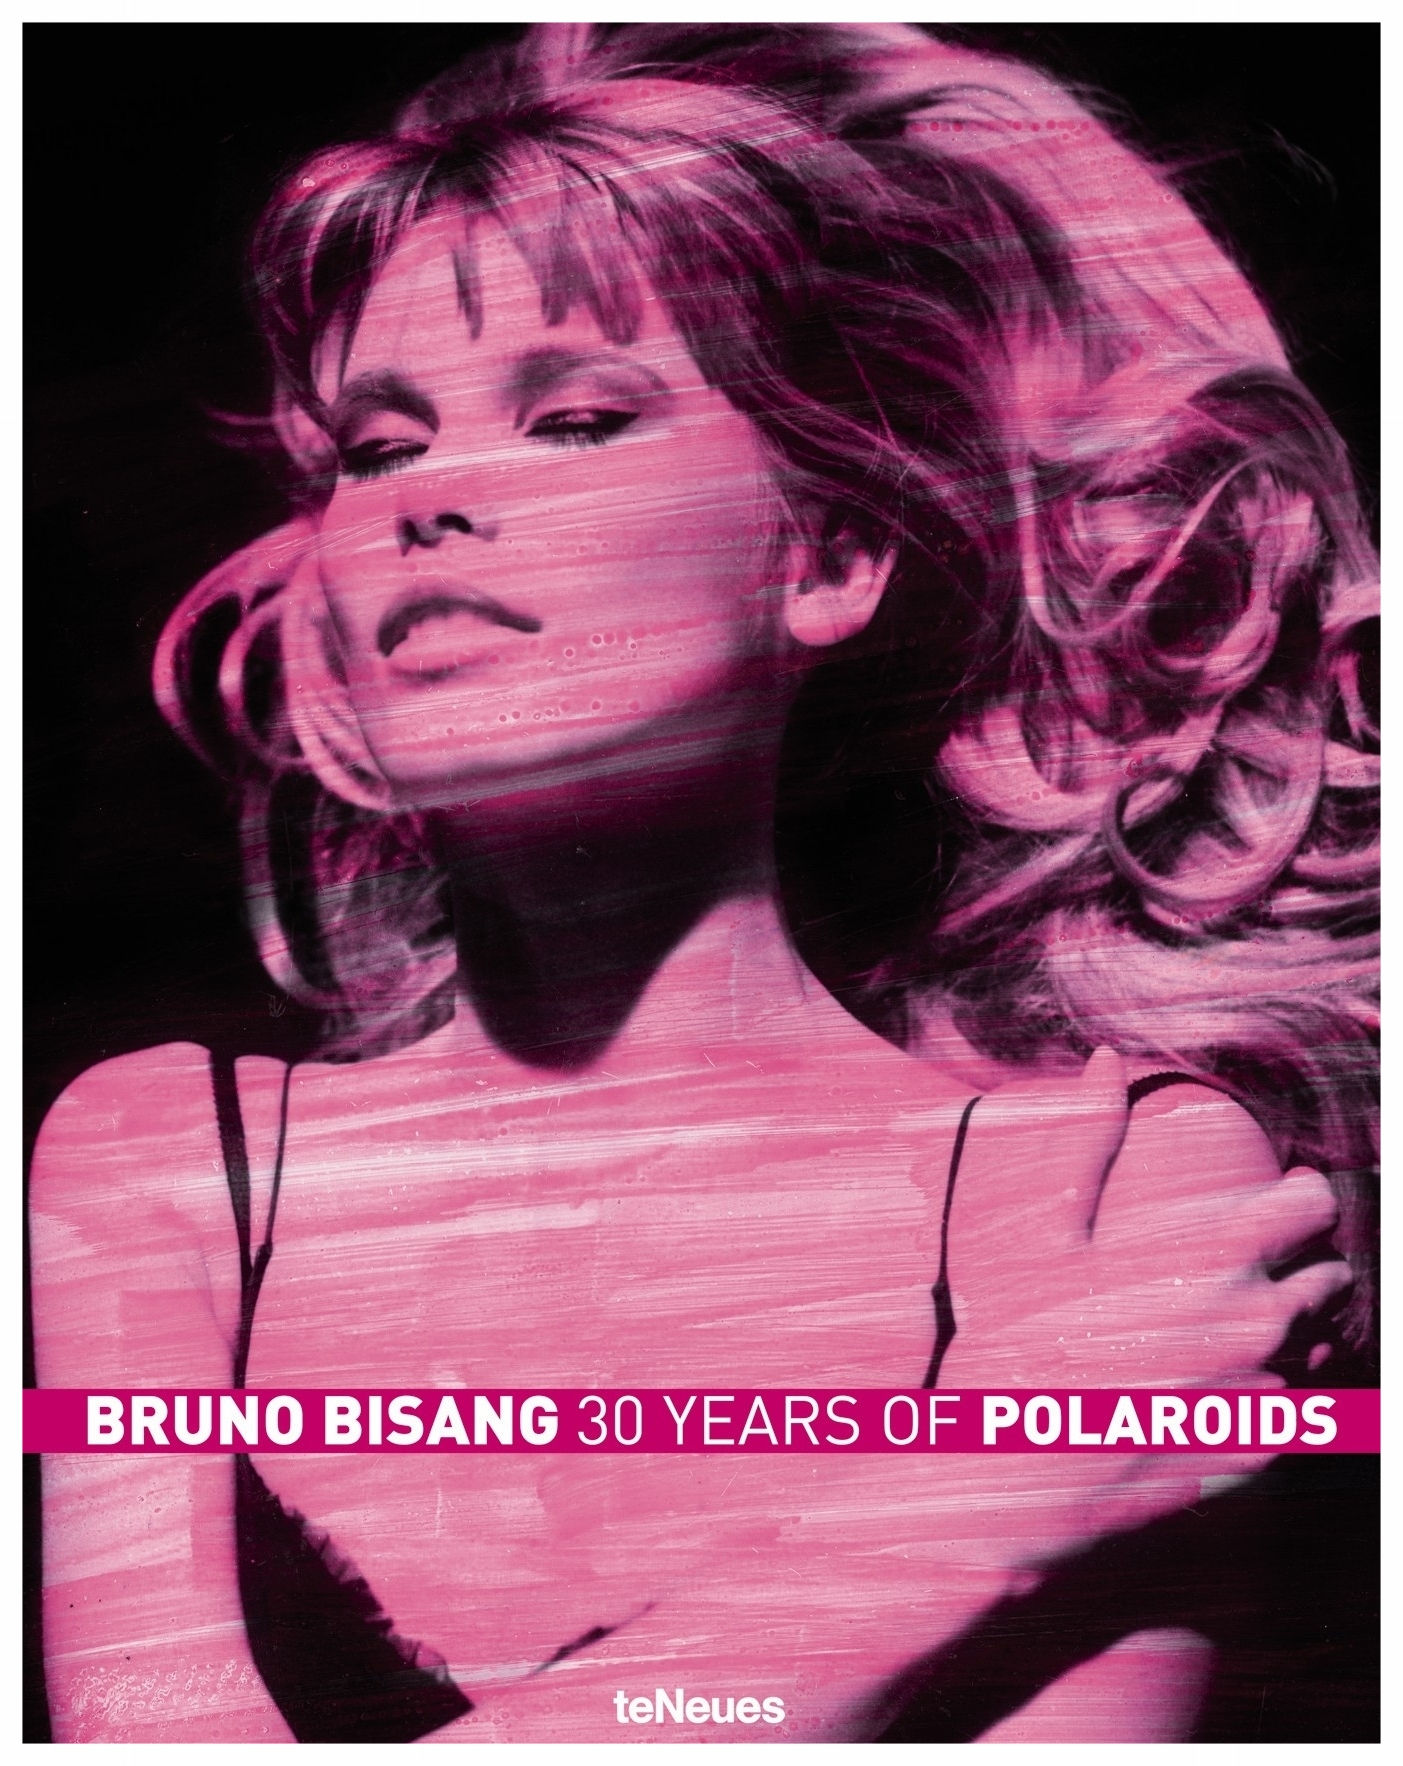 Cover 30 Years of Polaroids.jpg